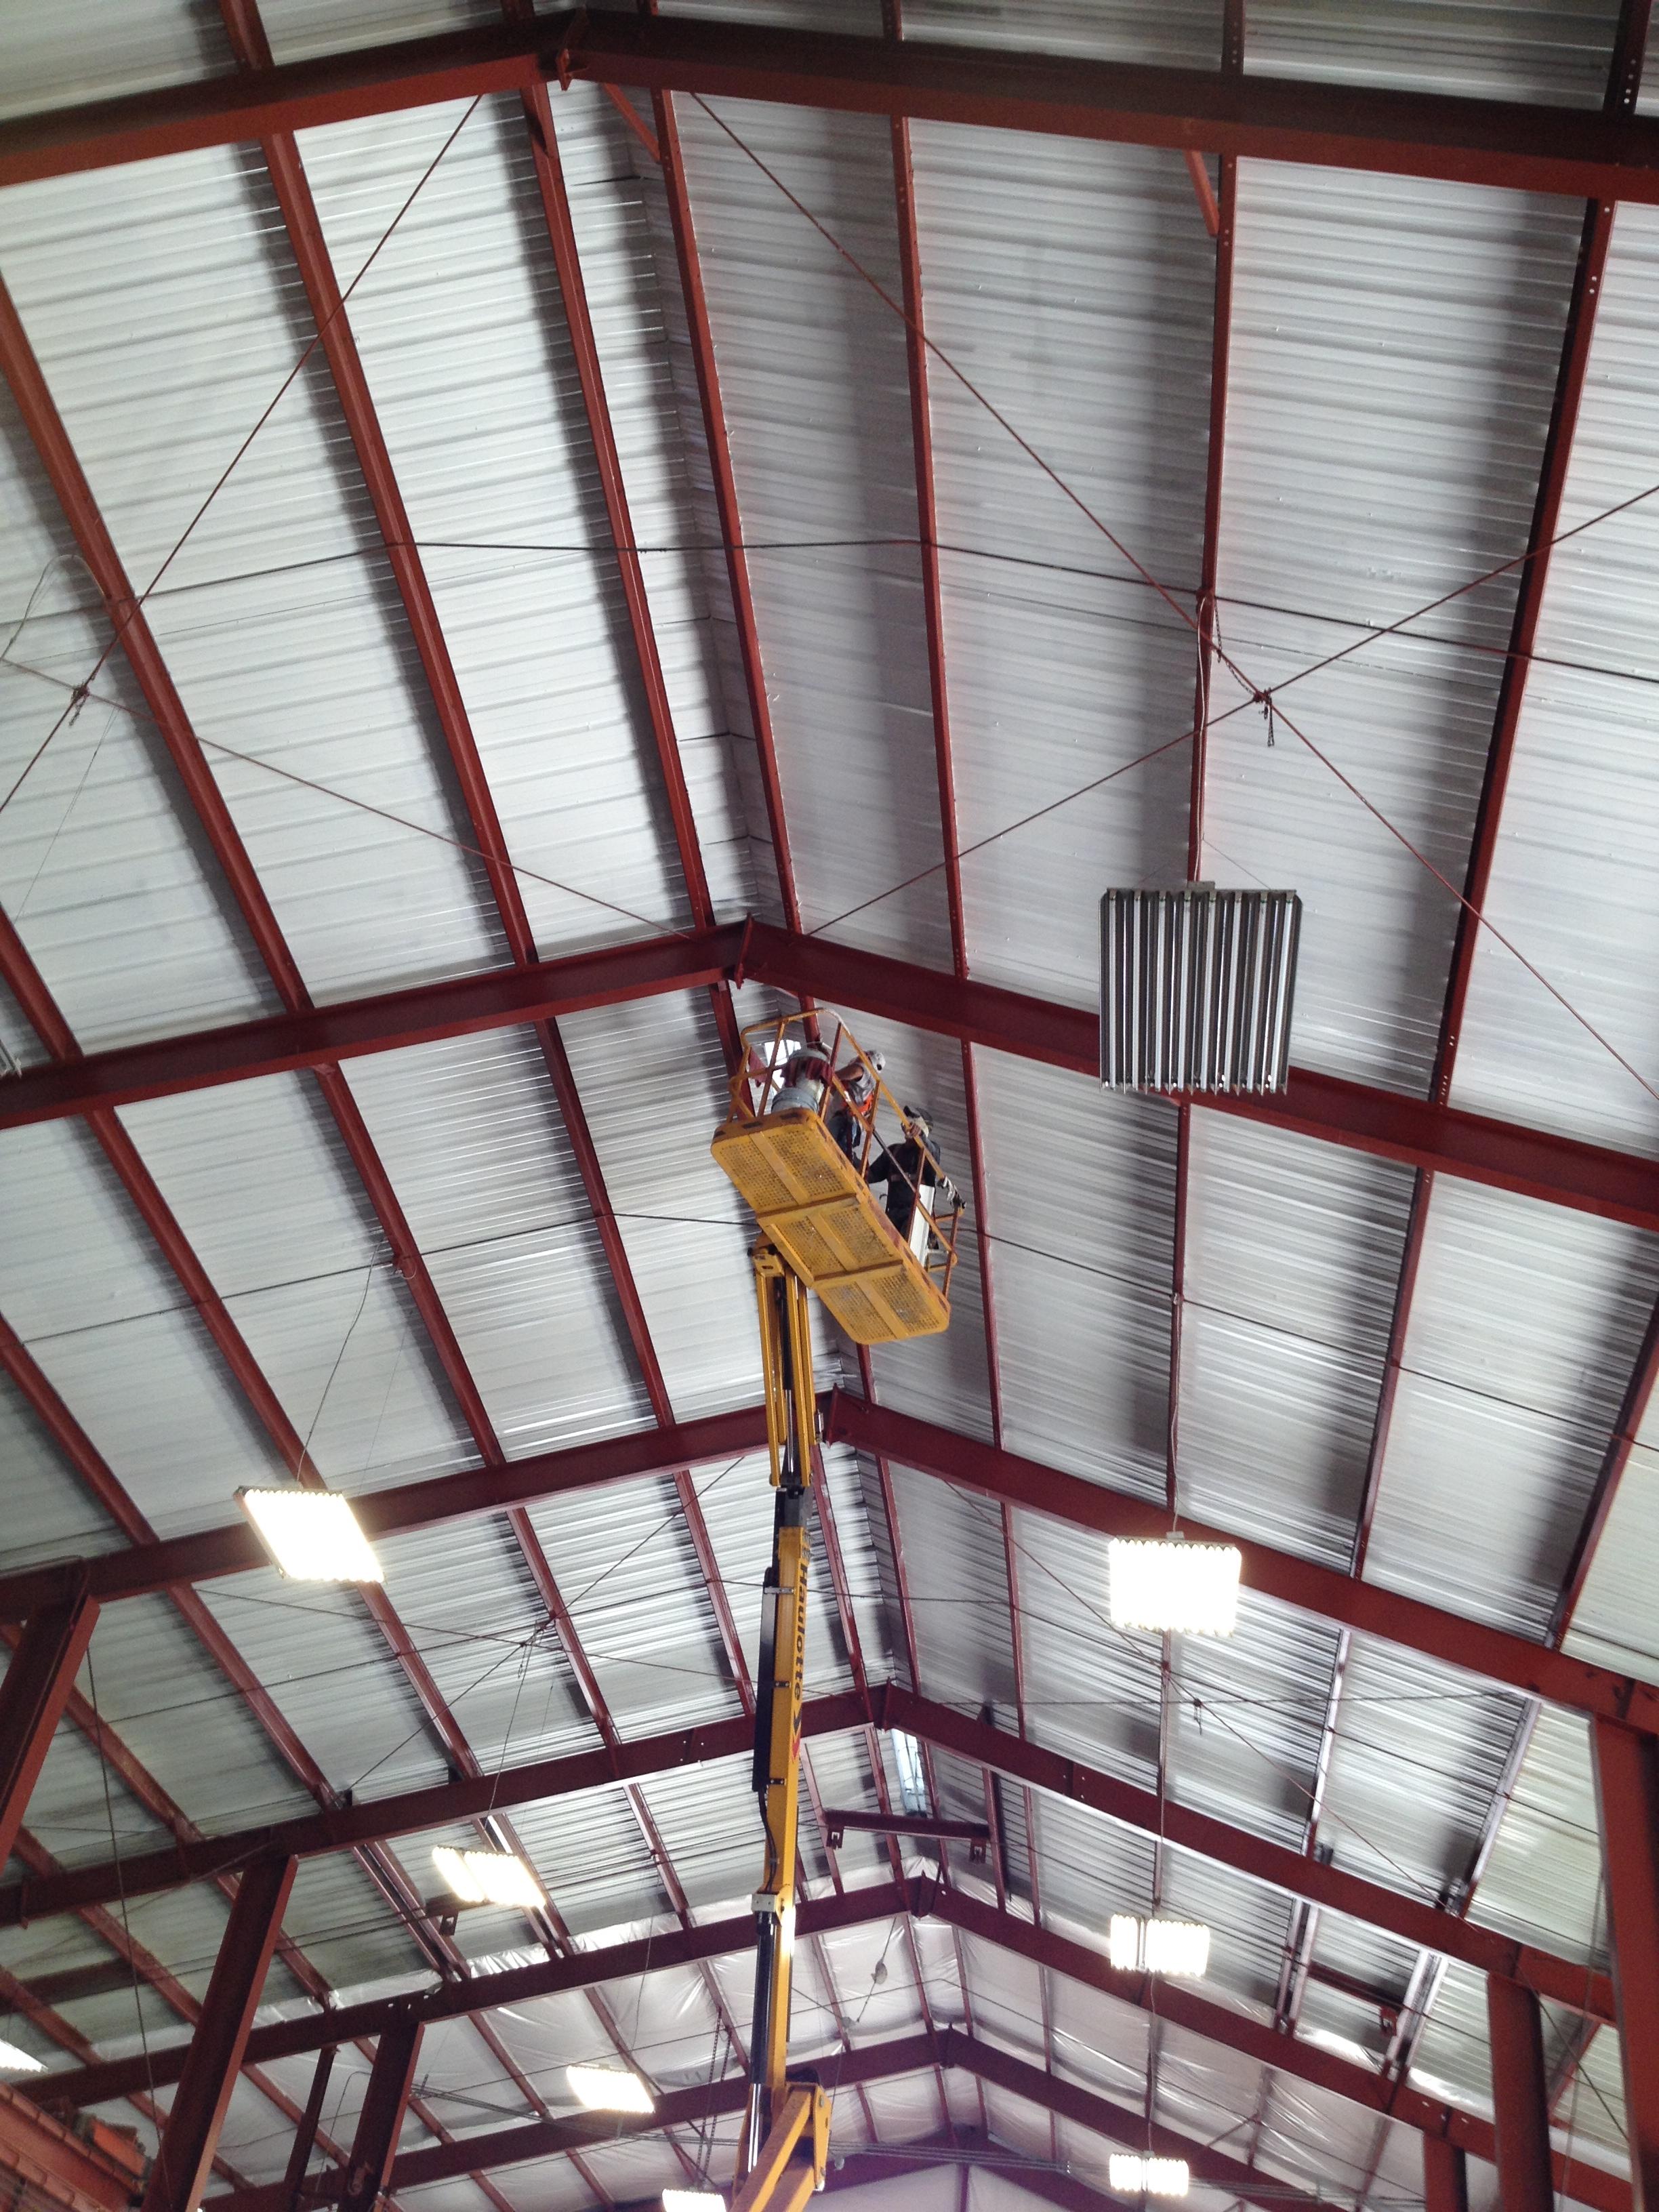 Industrial roof panting